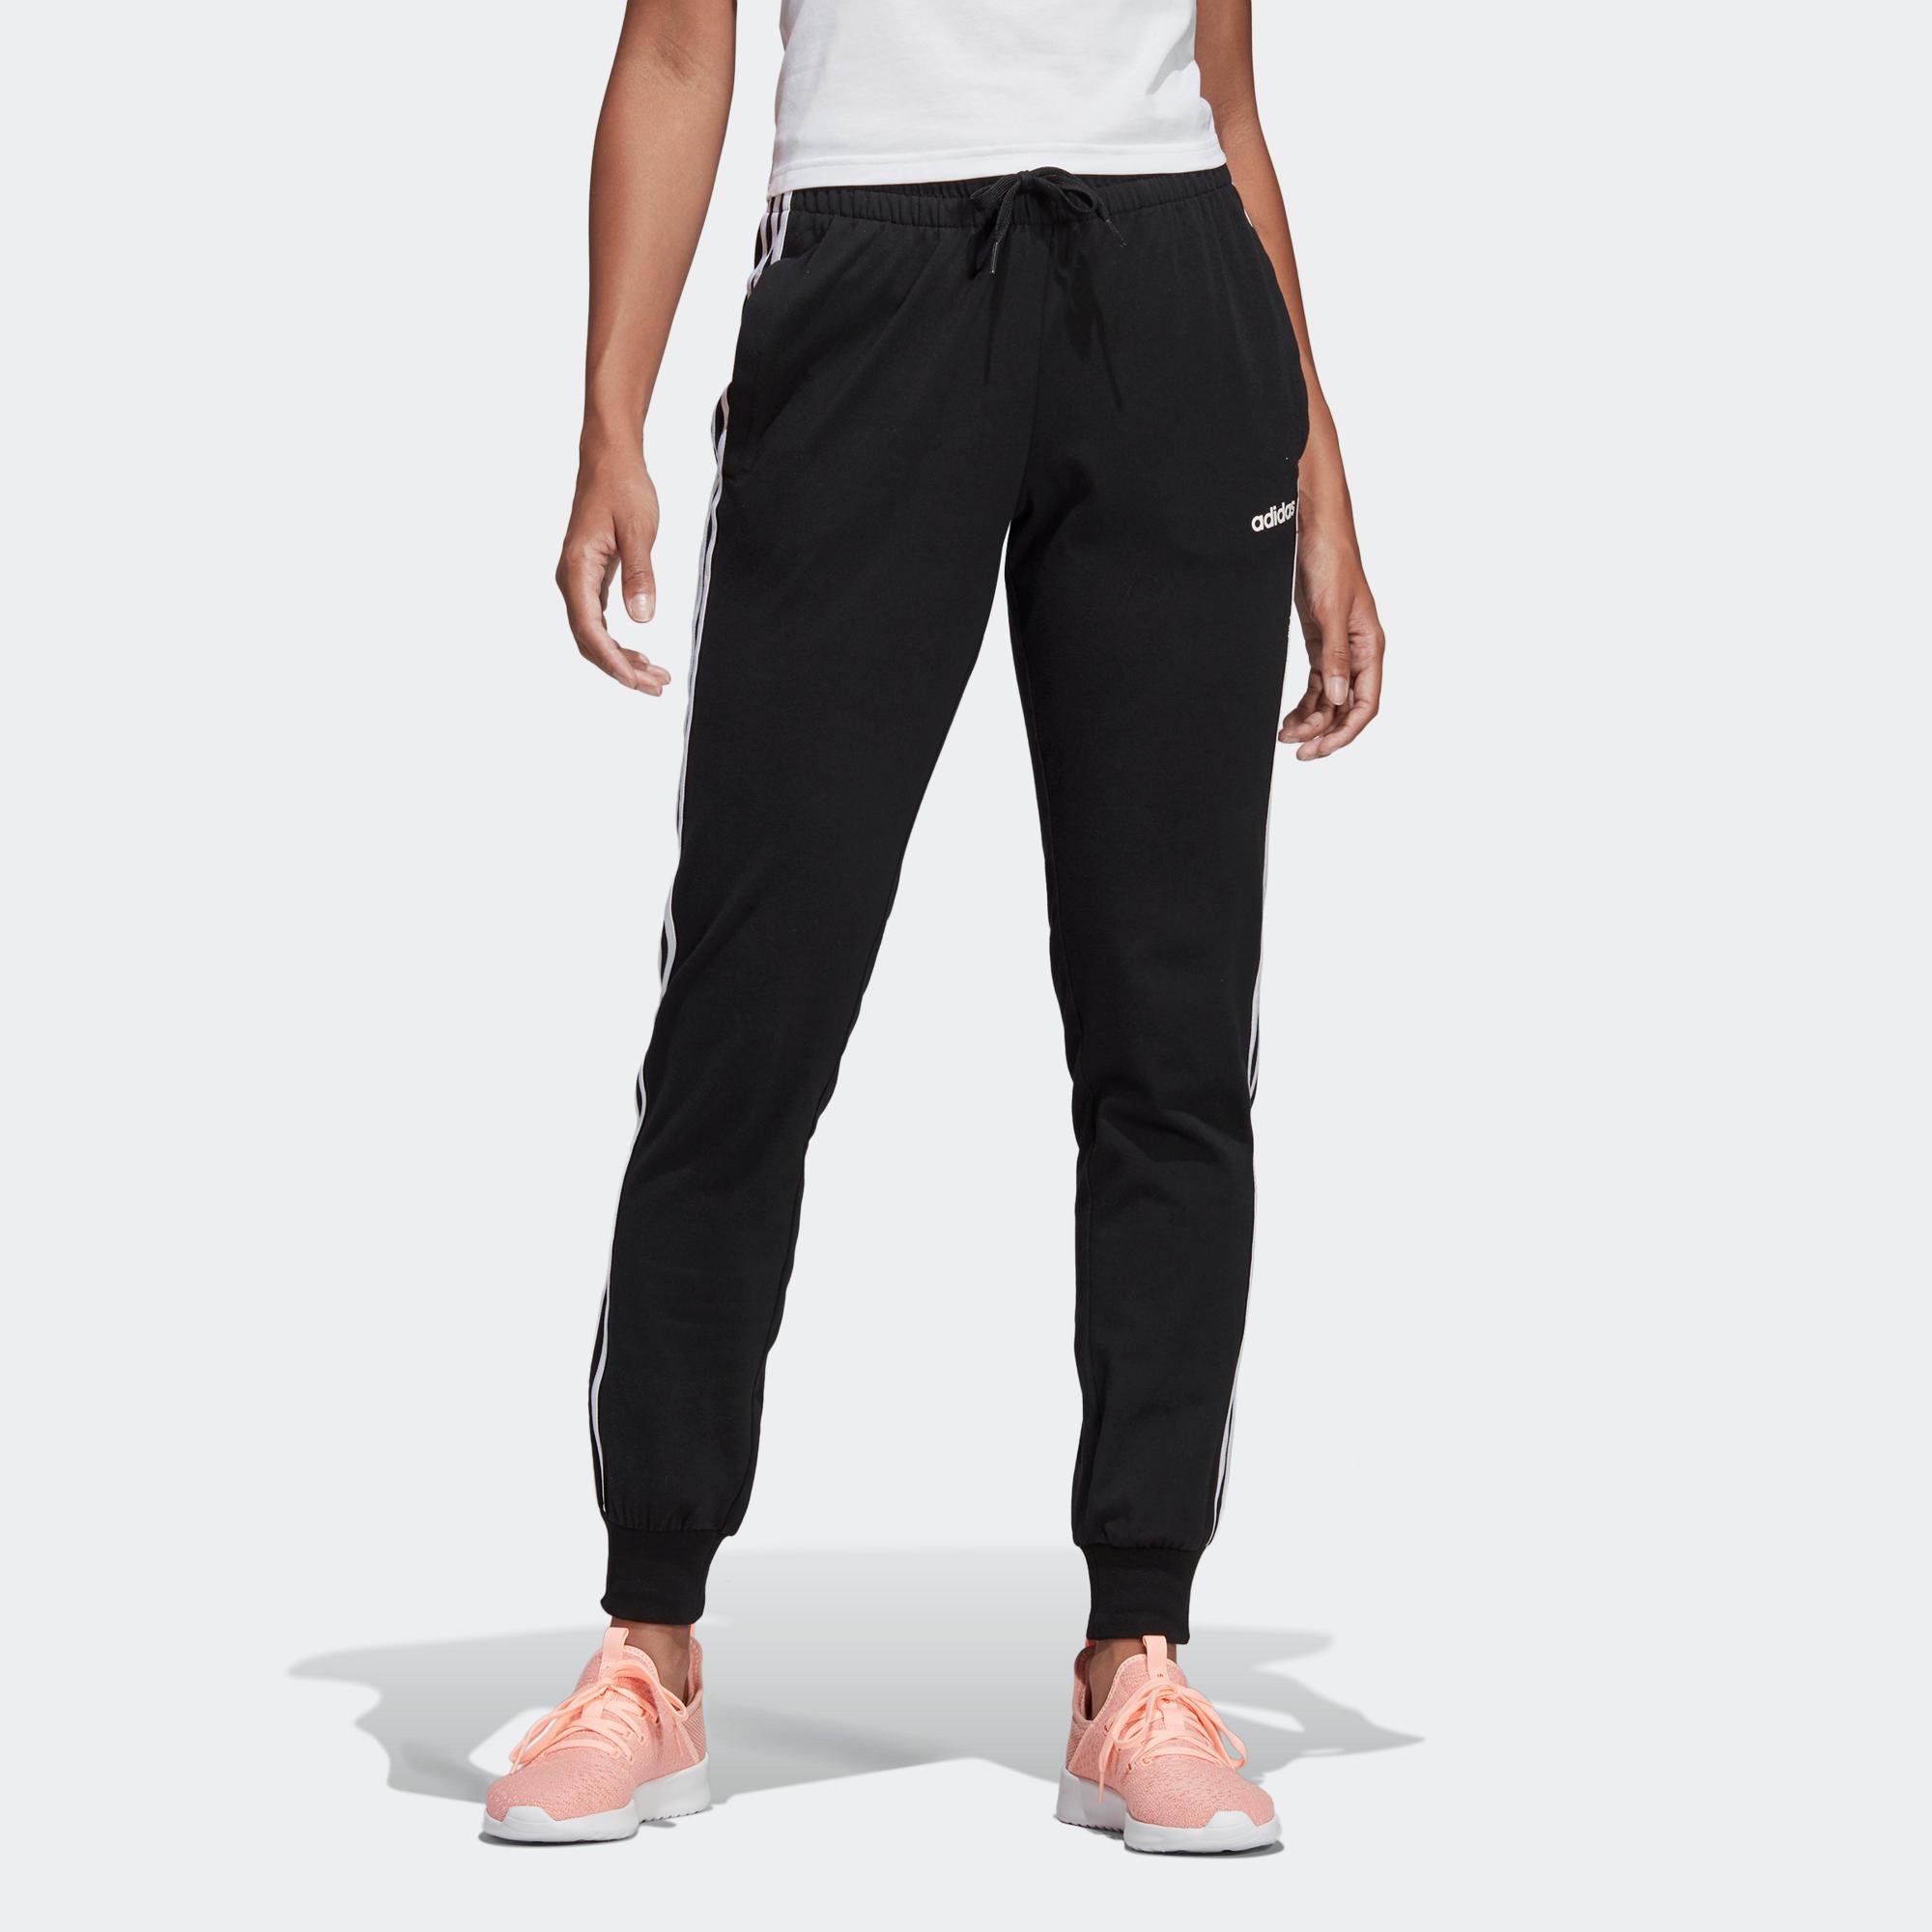 Damen Jogginghose in schwarz//schwarz